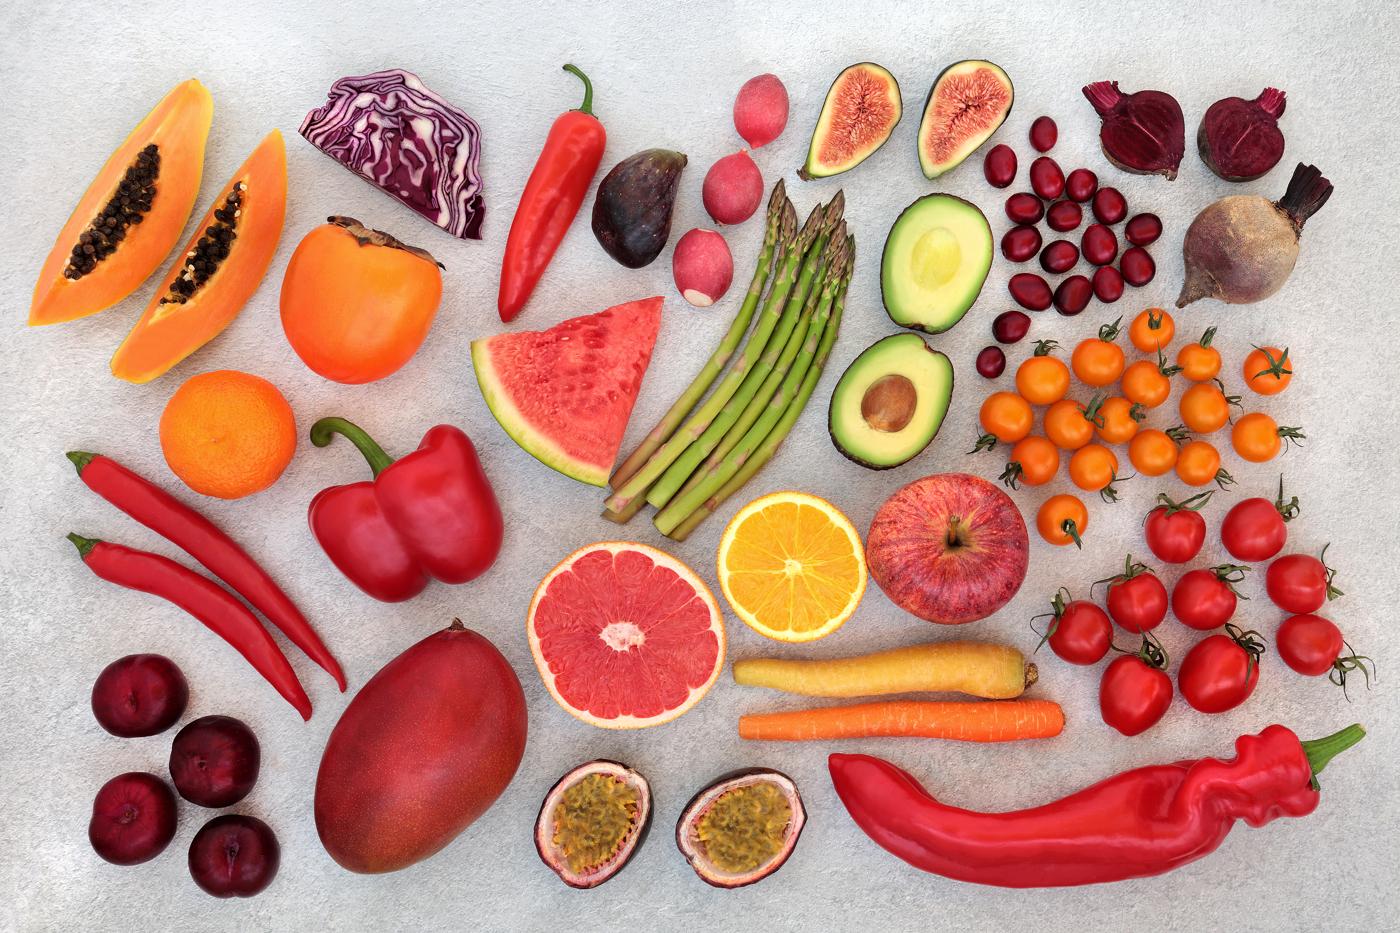 Health food stocks, Diet stocks, Healthy Lifestyle stocks